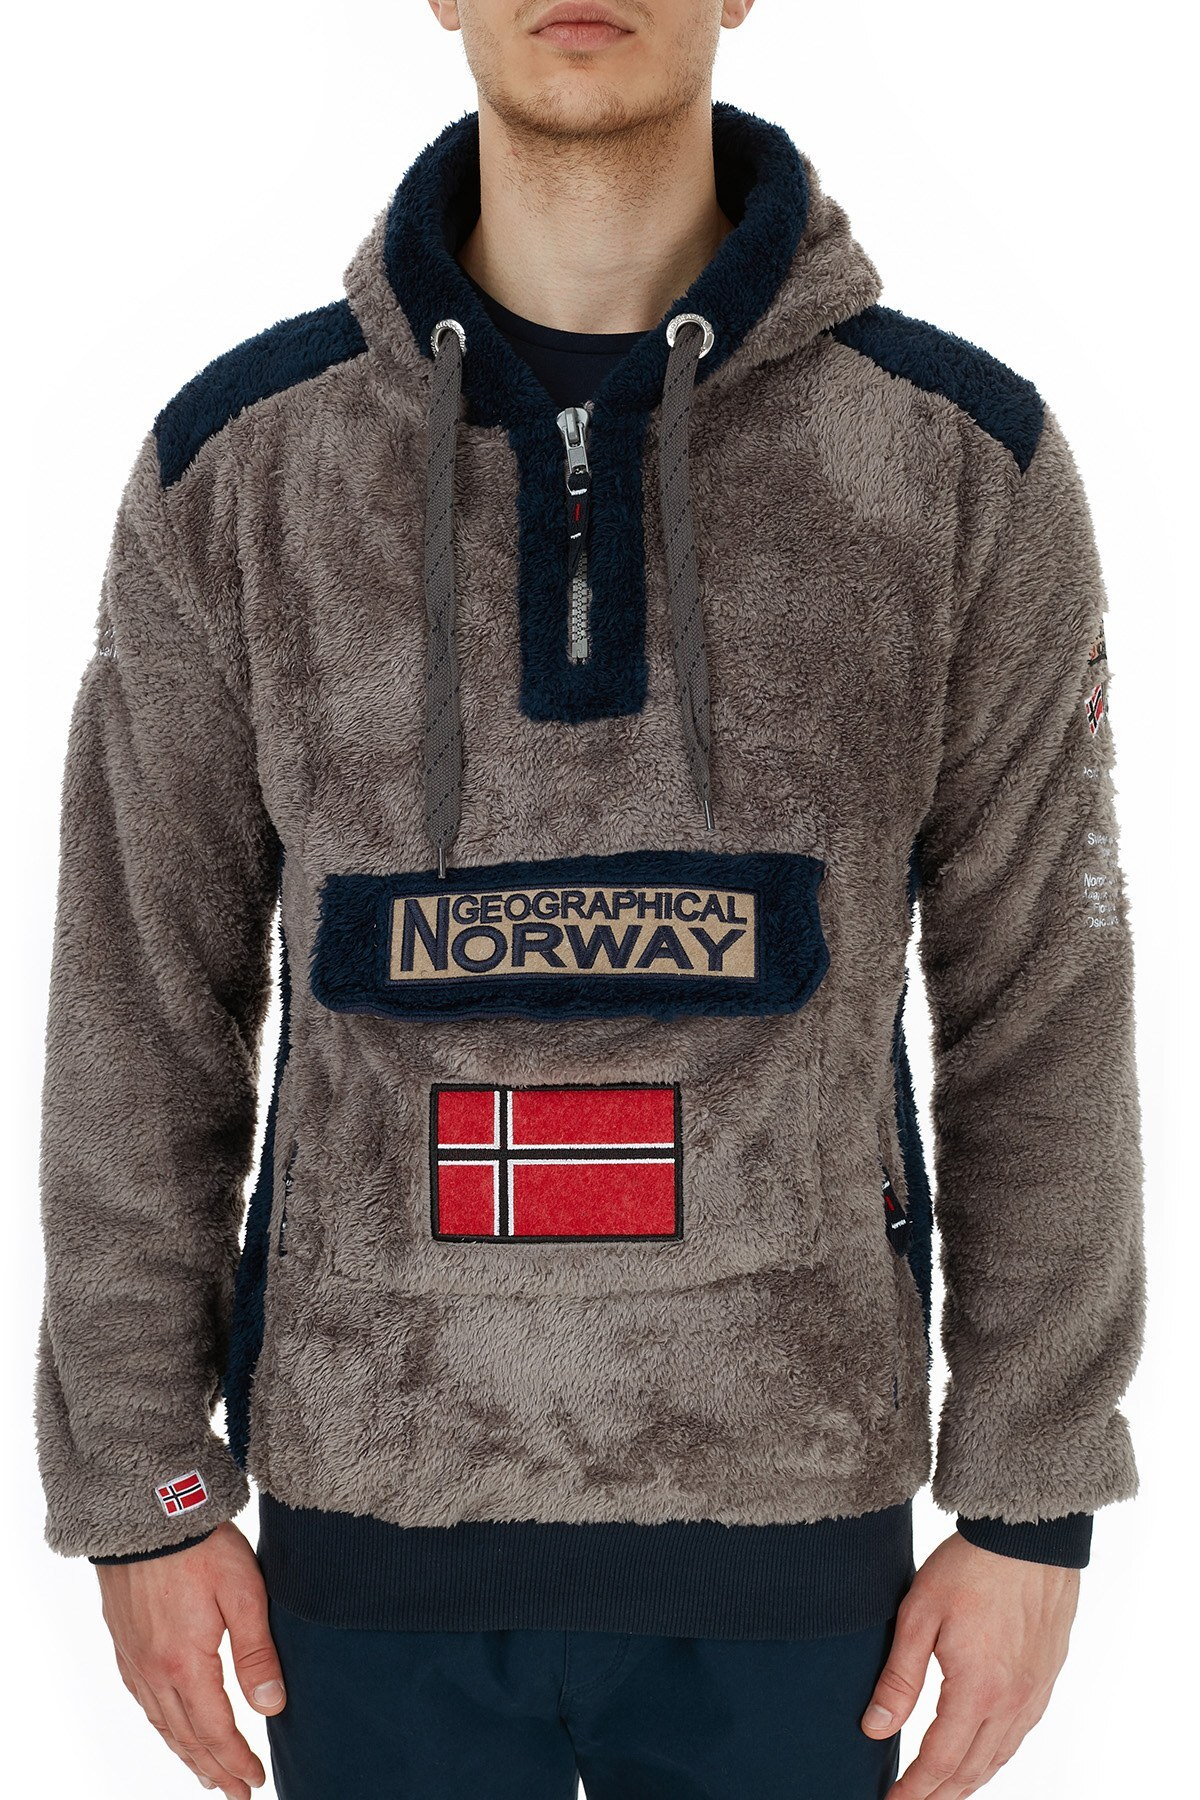 Norway Geographical Kapüşonlu Outdoor Polar Erkek Sweat GYMCLASS E KOYU GRİ